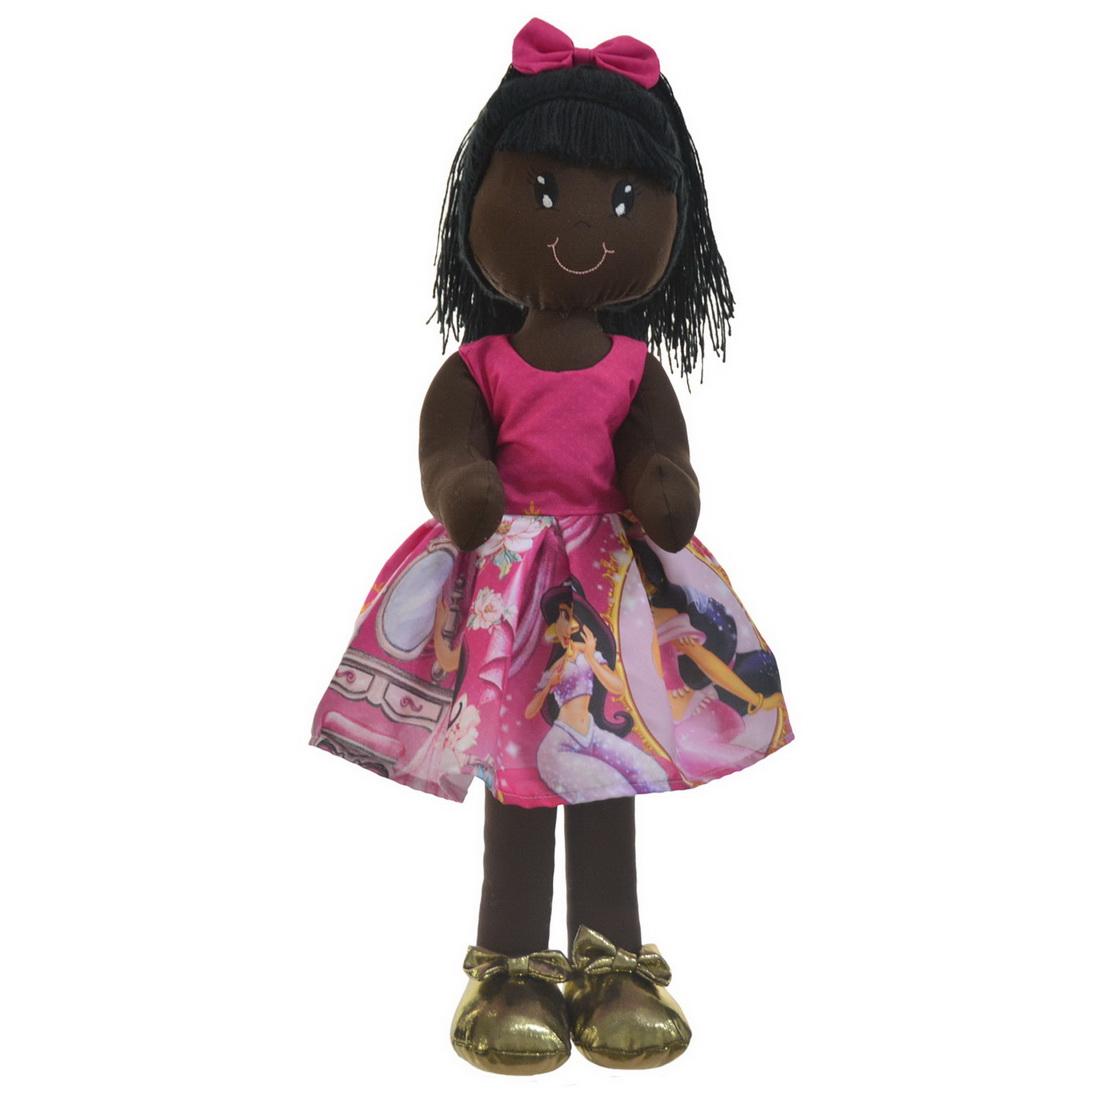 Boneca de Pano Negra Nina com Roupa tema Jasmine